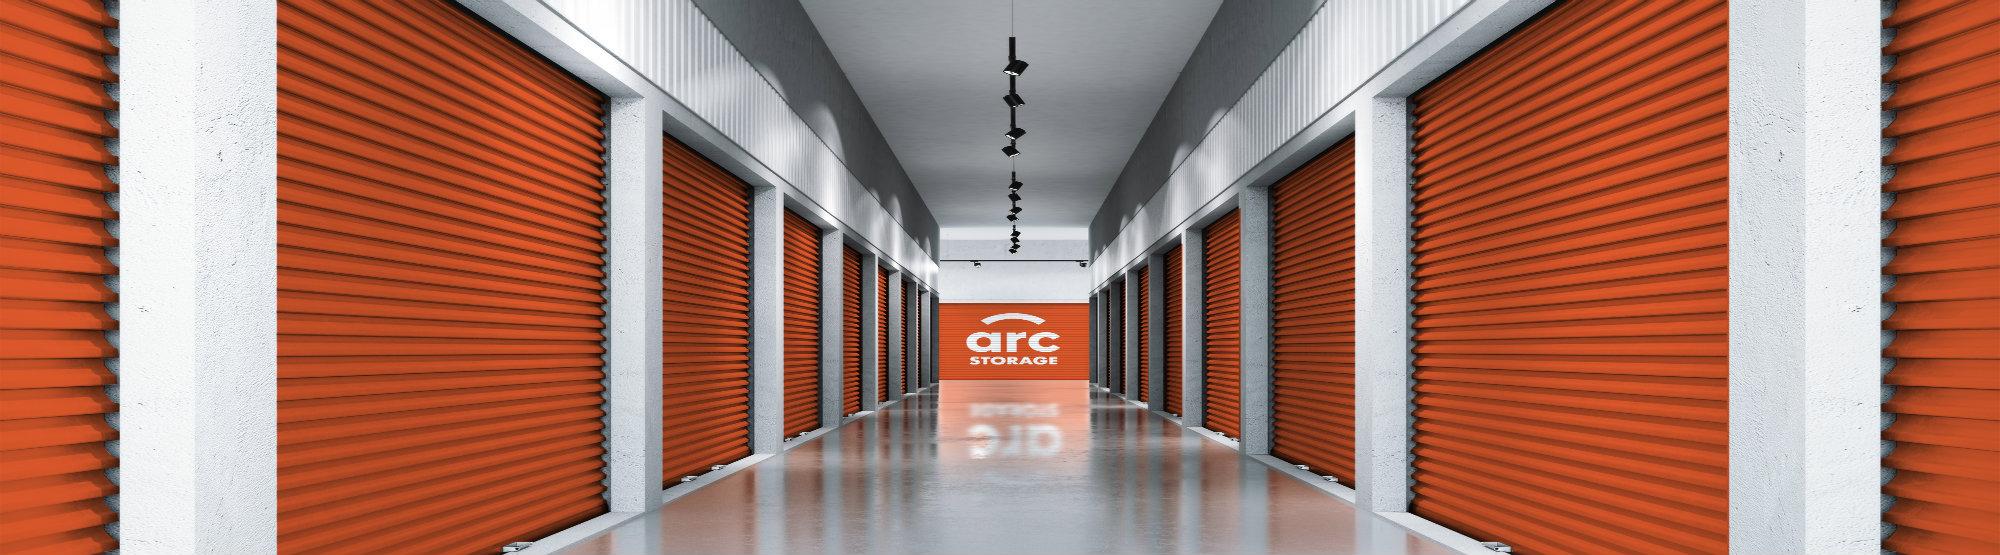 Rows of orange storage units for Arc Storage